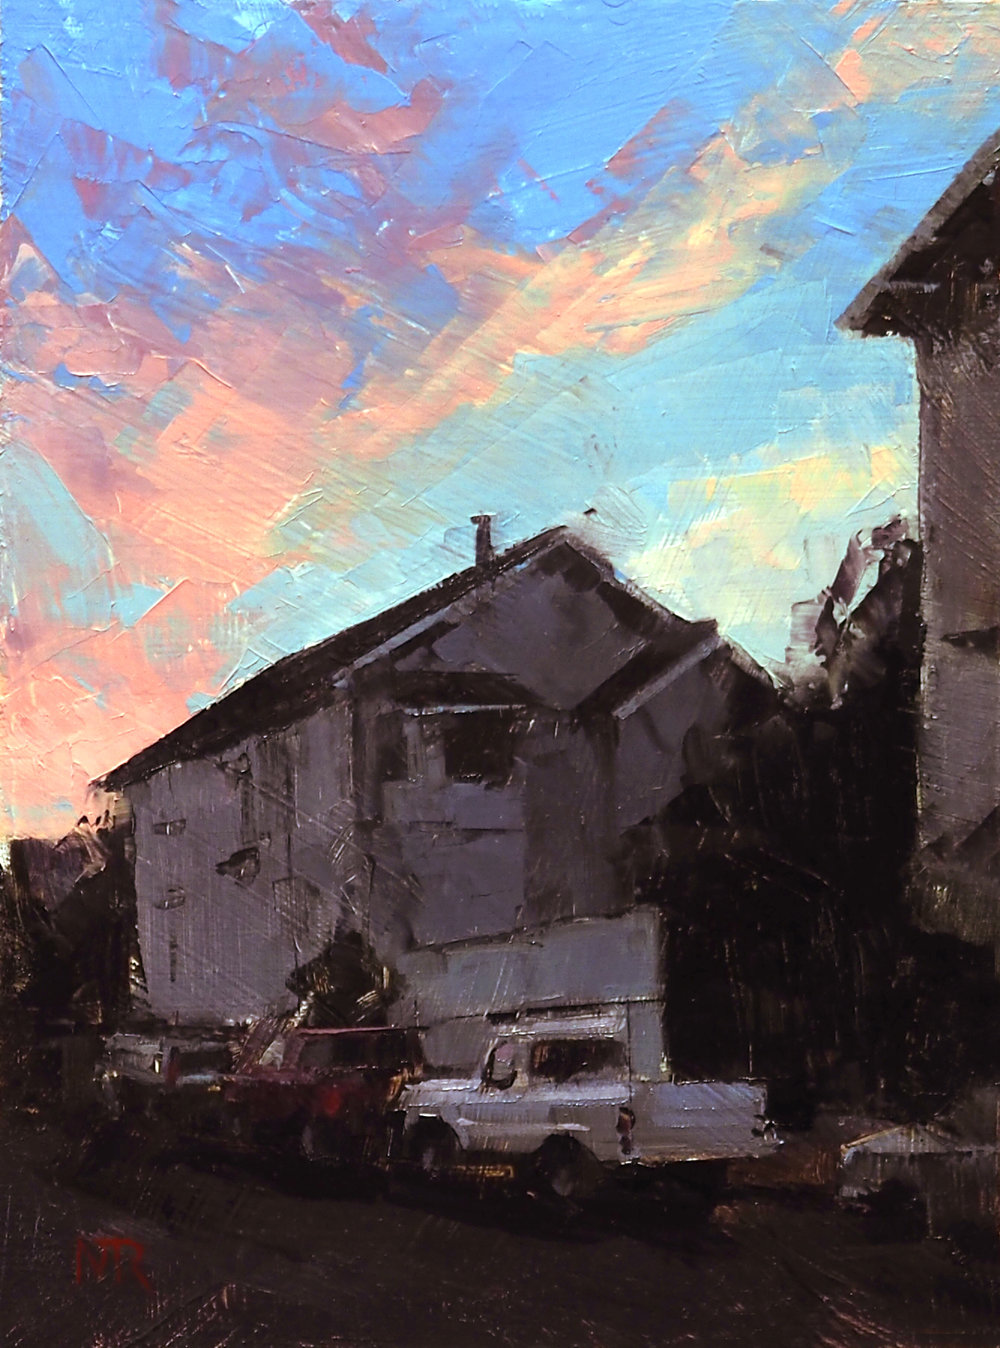 Study of Neighborhood at Dusk